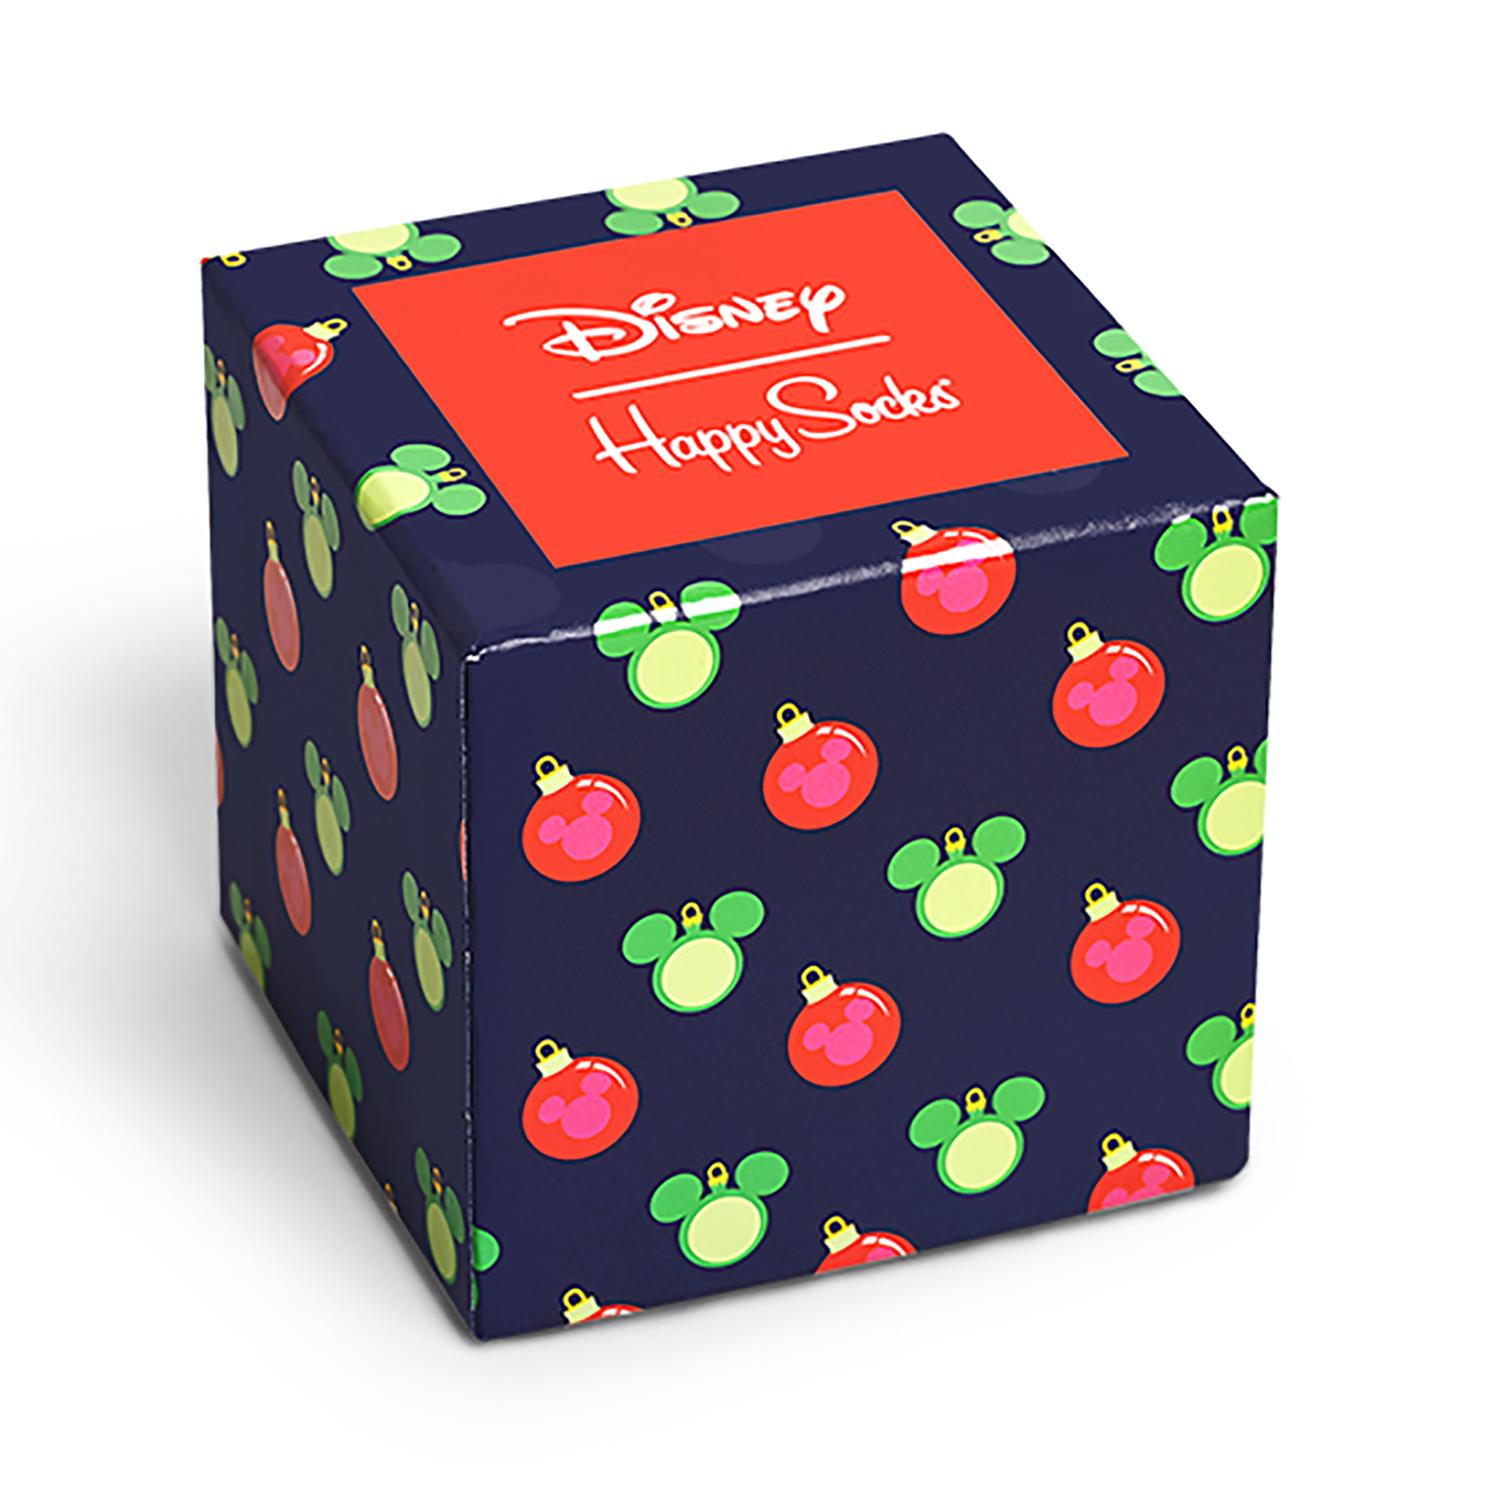 Happy Socks – Disney Kids 7-9 Years 4 Pairs of Christmas Socks Boxed Gift Set